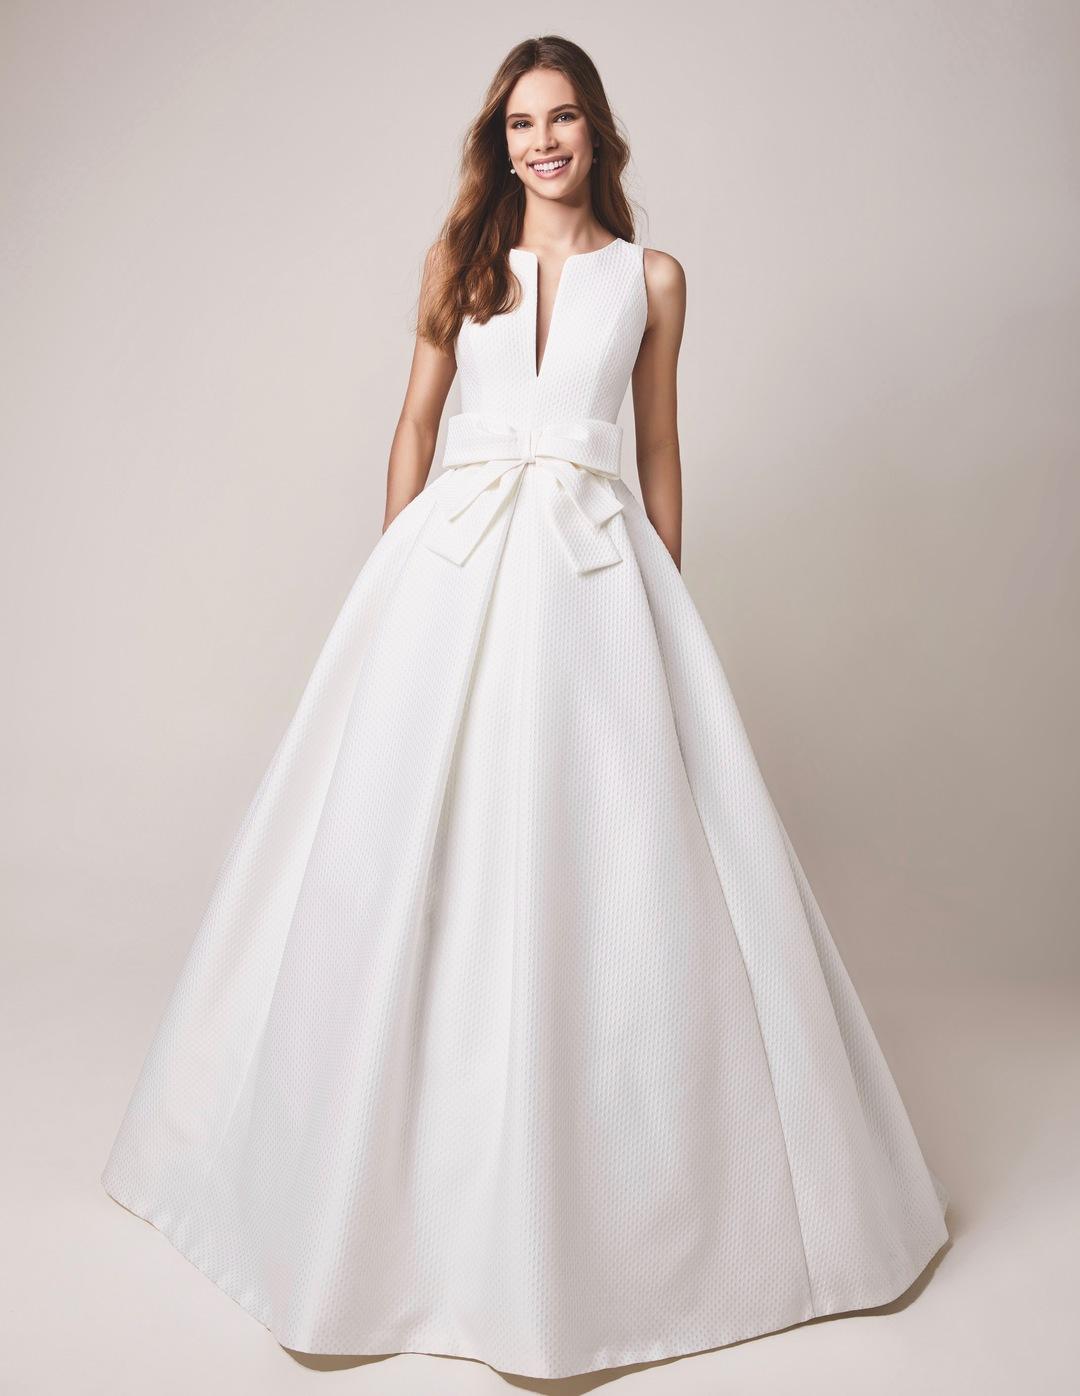 110 dress photo